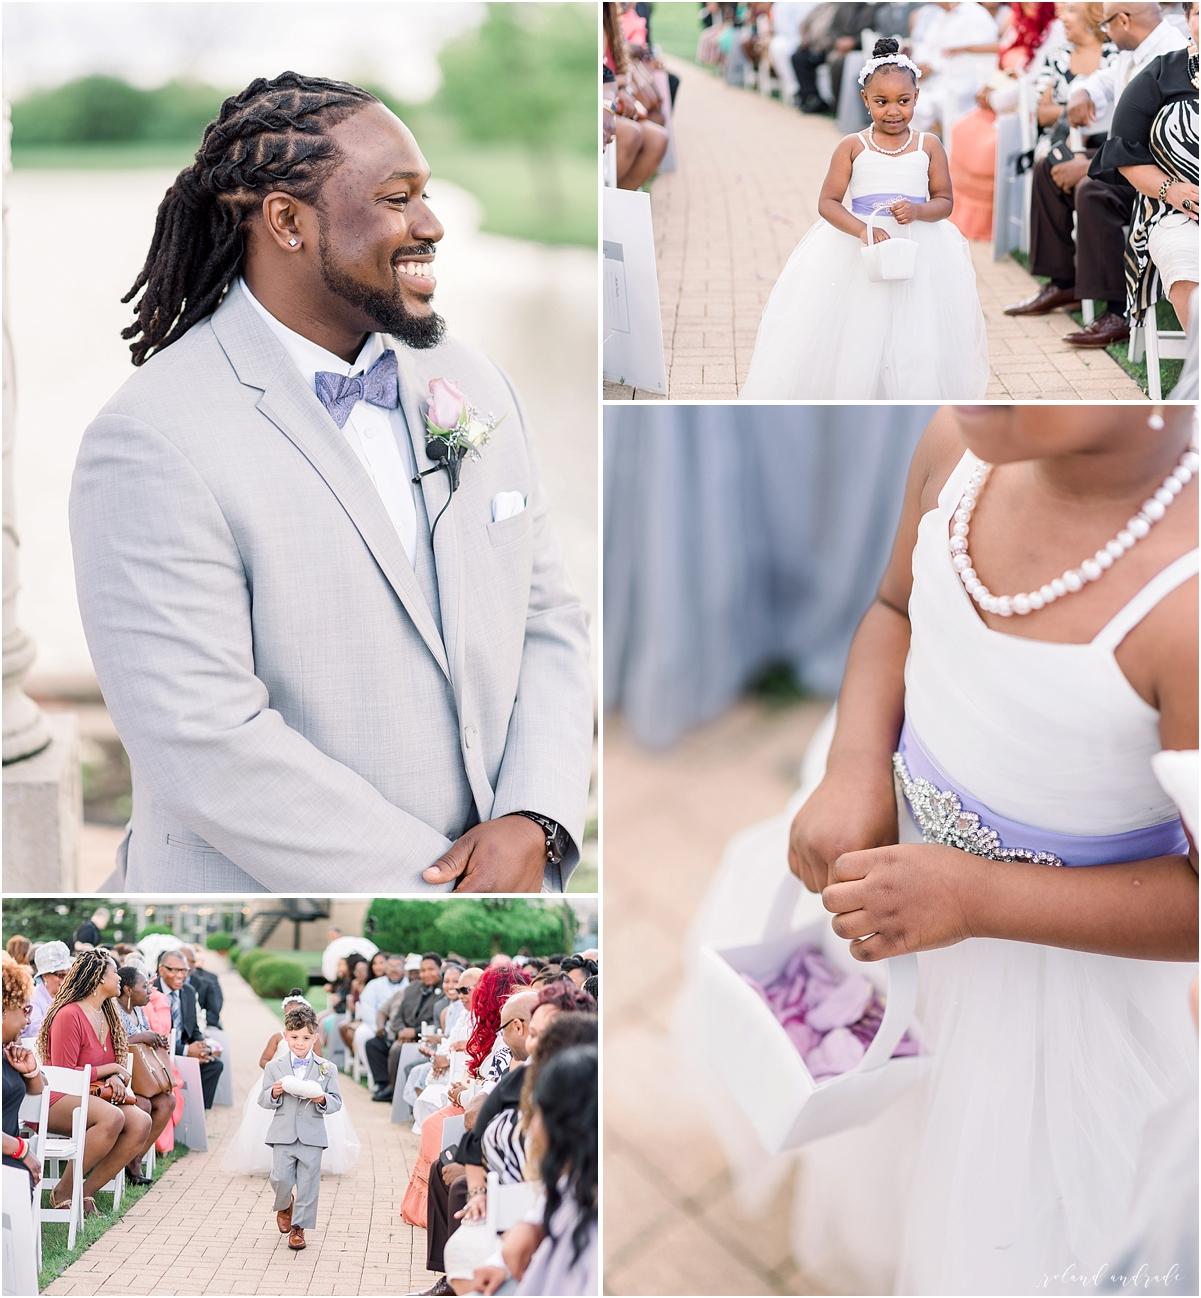 The Odyssey Wedding, Tinley Park Wedding, Chicago Wedding Photographer, Best Photographer In Tineley Park, Best Photographer In Chicago, Light And Airy Photographer_0034.jpg